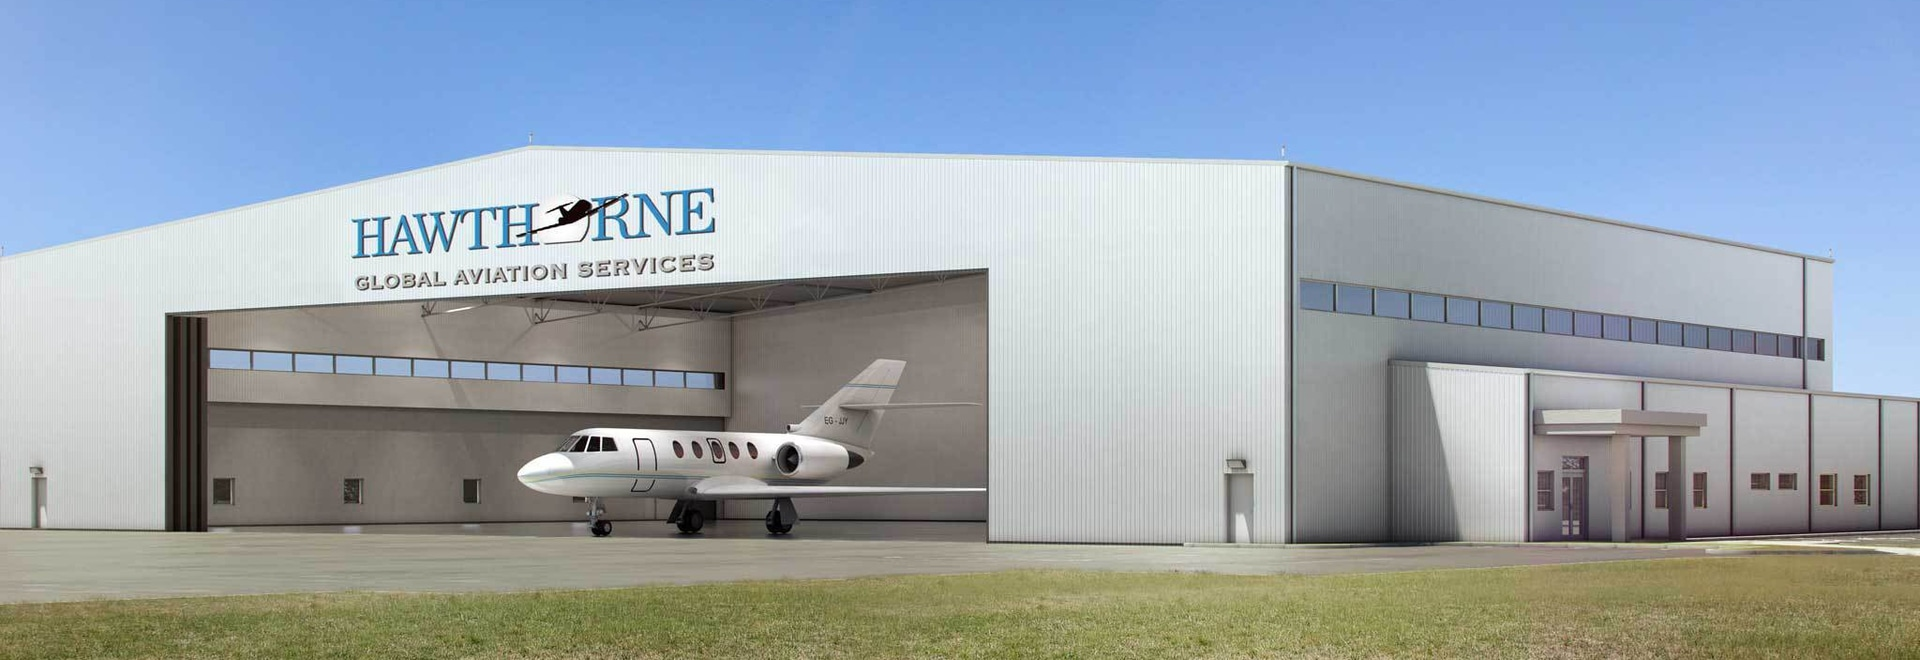 Long Island FBO To Add New Hangar